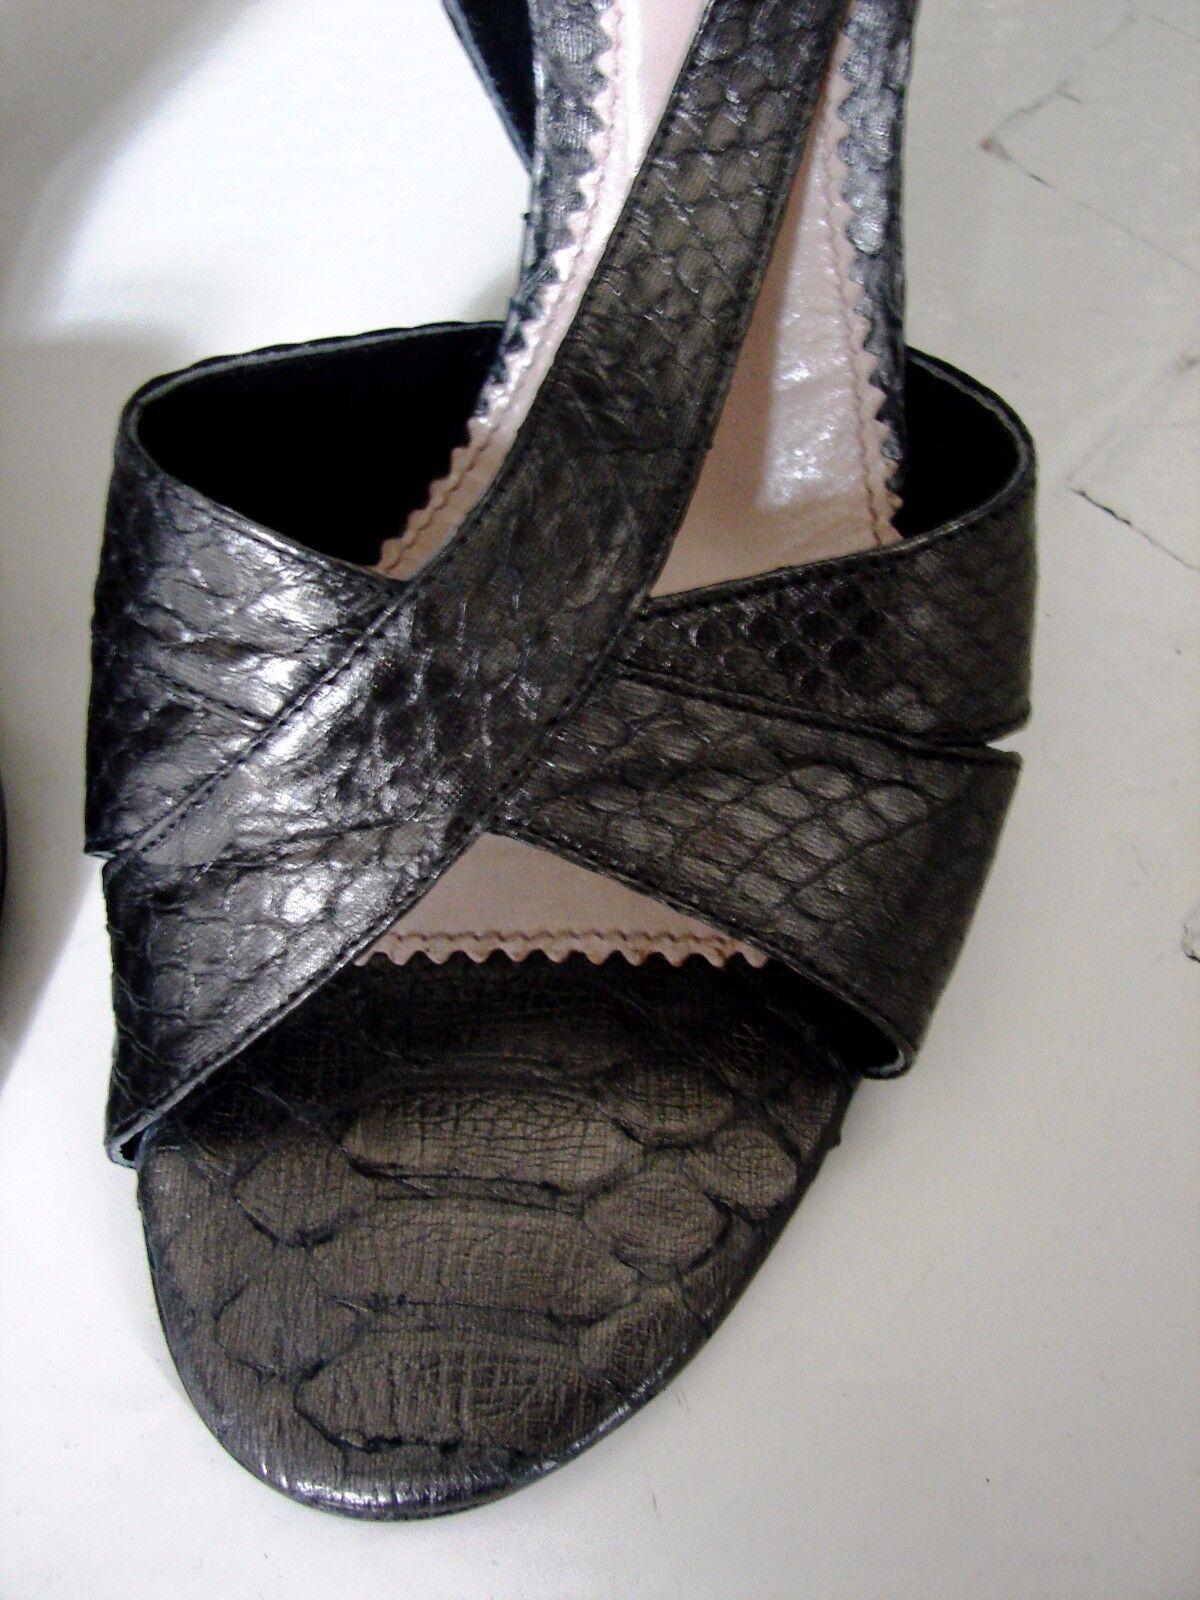 Chloe runway python leather snakeskin stiletto heels sandals sandals sandals shoes T40 8,5 9 NEW 7b3391